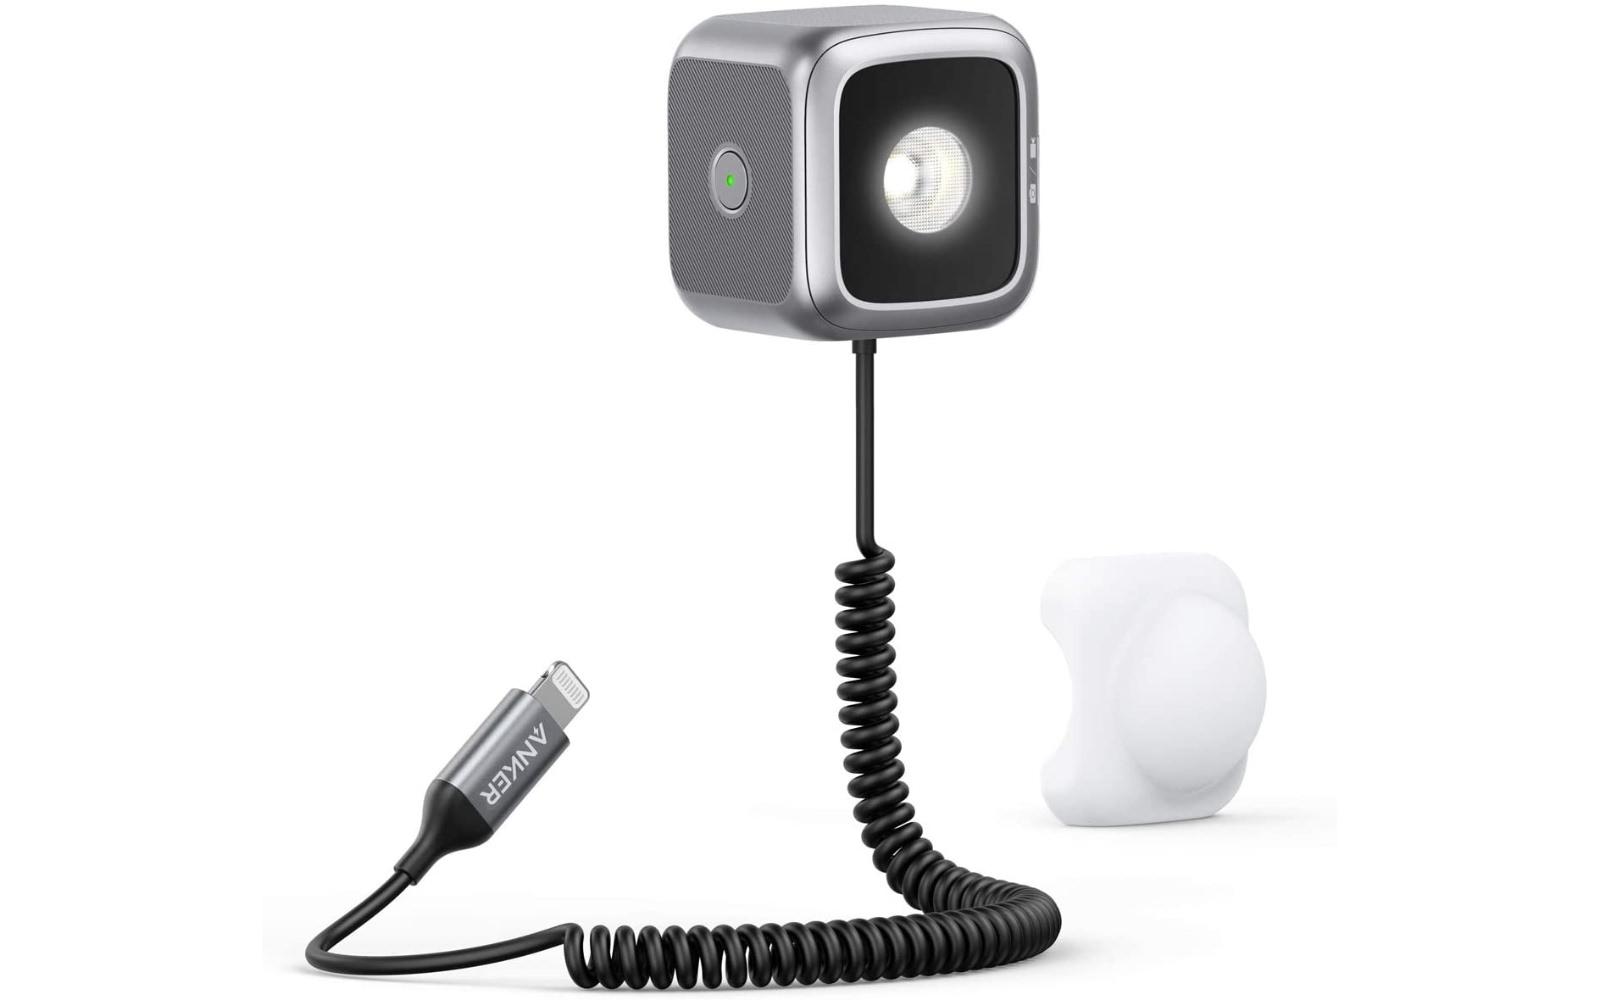 Anker iphone LED flash MFI